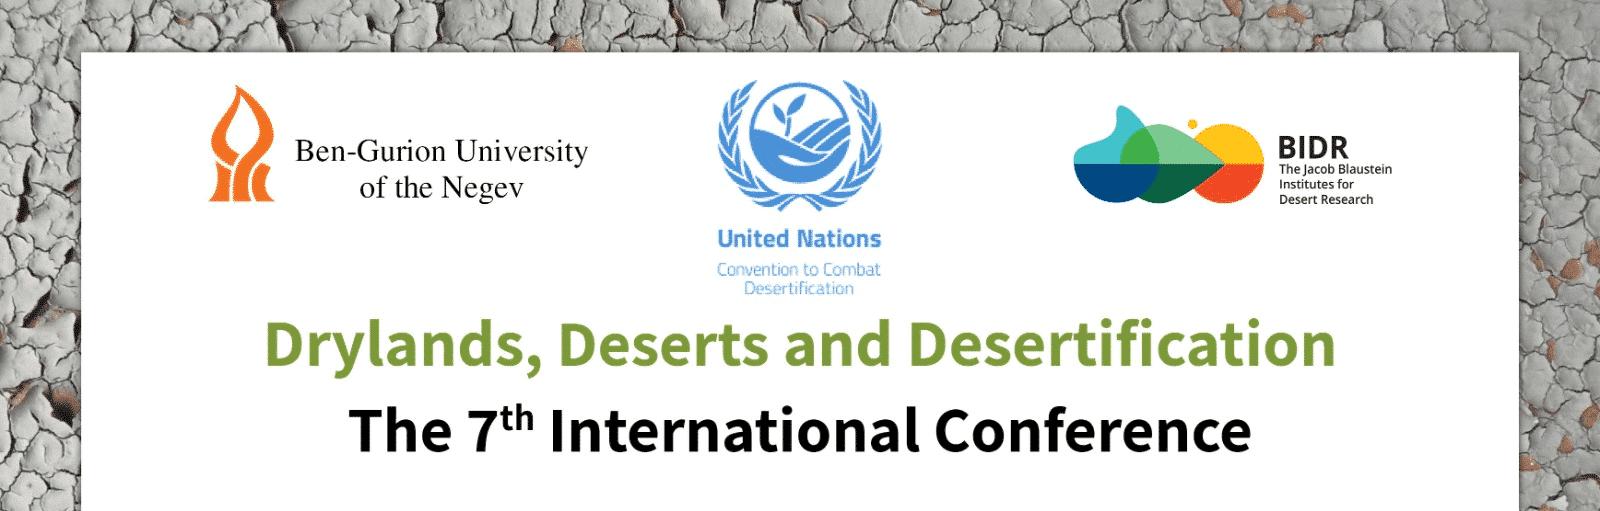 Drylands, Deserts and Desertification